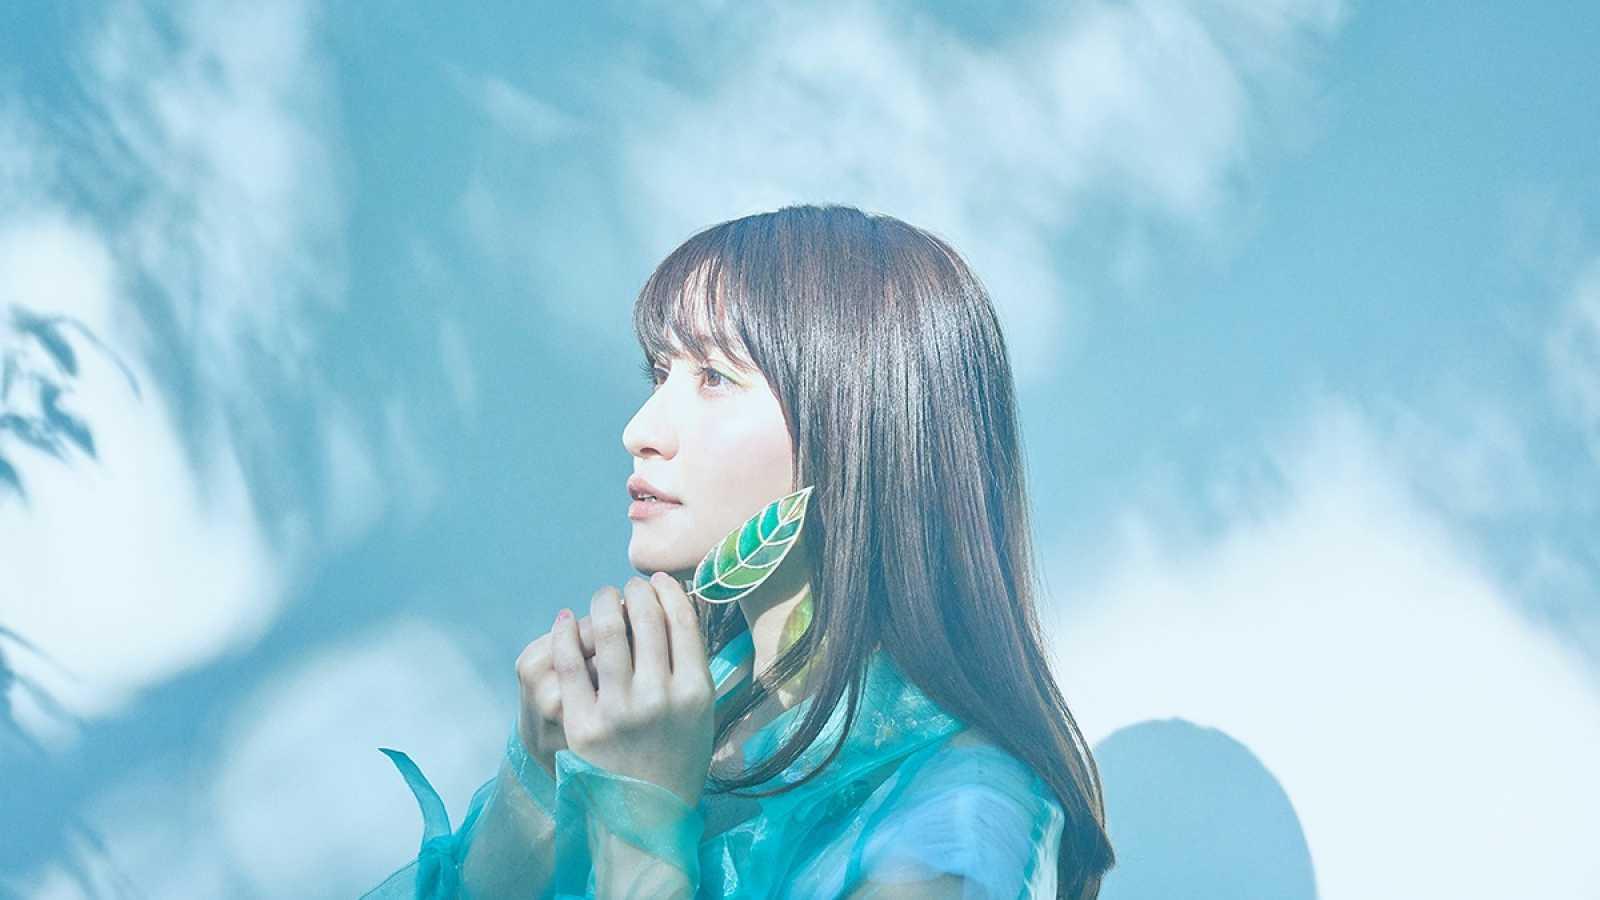 Nakajima Megumi © FlyingDog, Inc. All rights reserved.